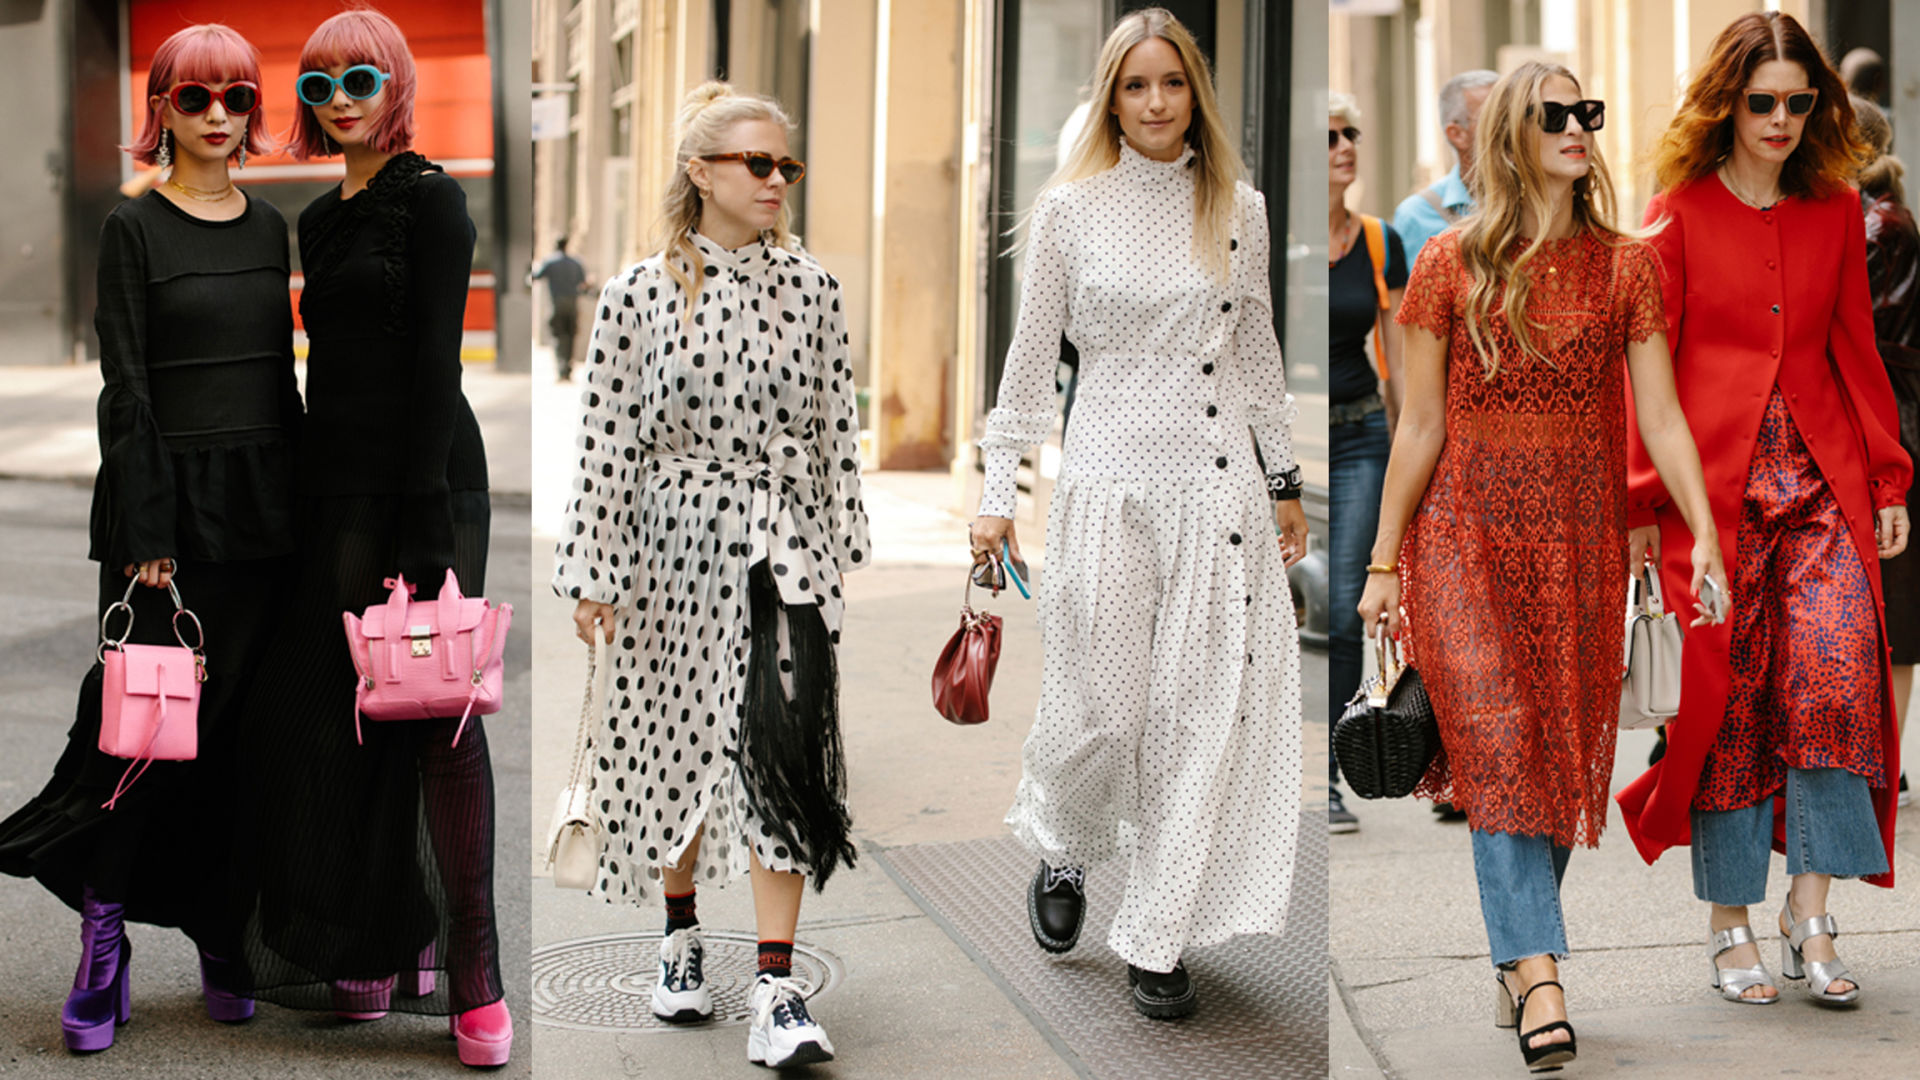 hp-new-york-fashion-week-street-style-spring-2018-day-5.jpg